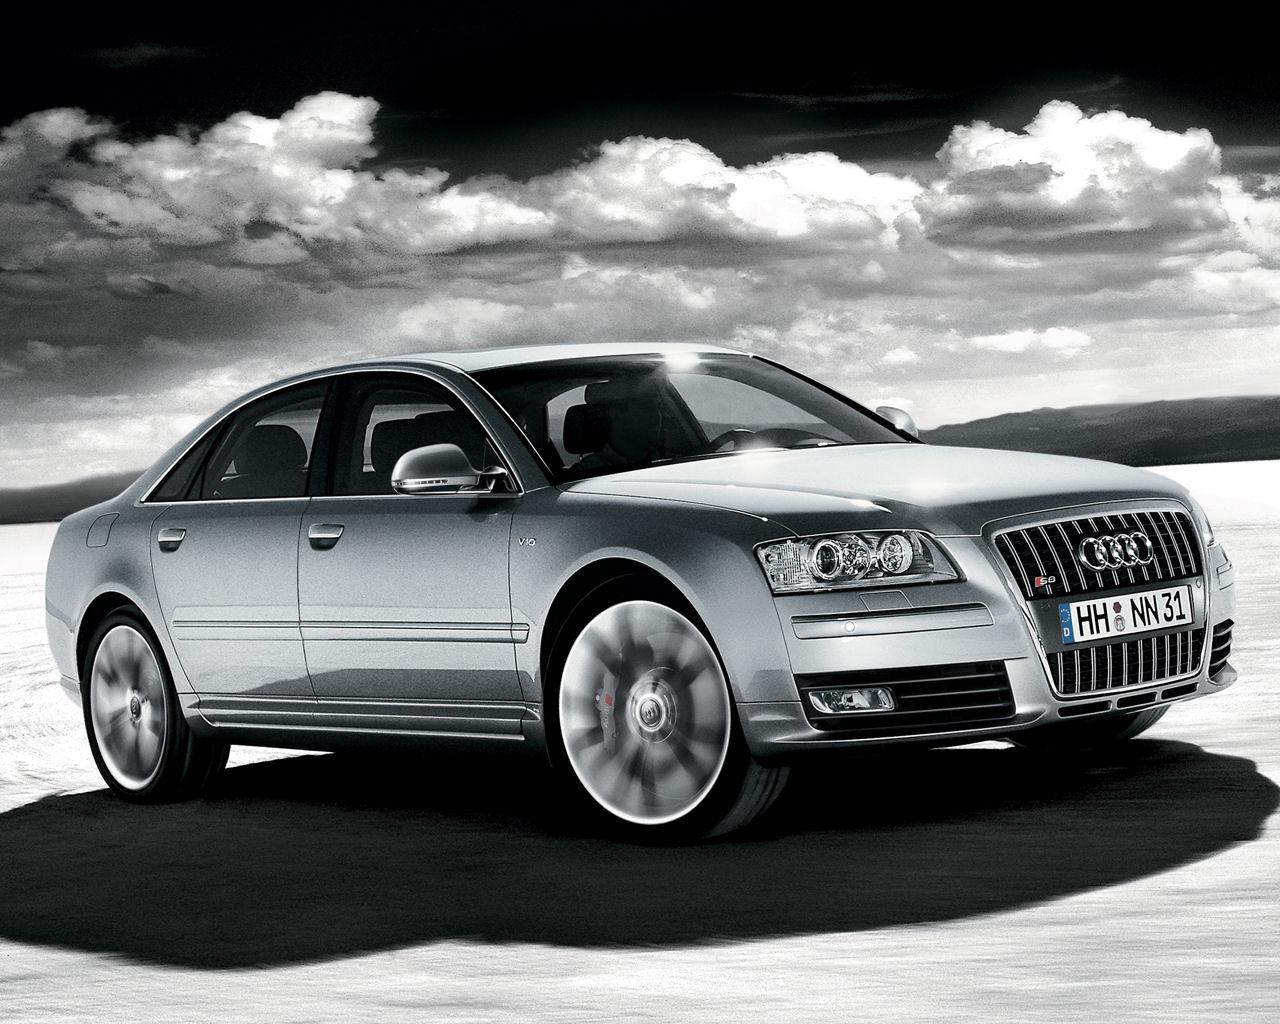 Audi A8 A8L 42 W12 S8 Quattro   1280x1024 Wallpaper 1280x1024